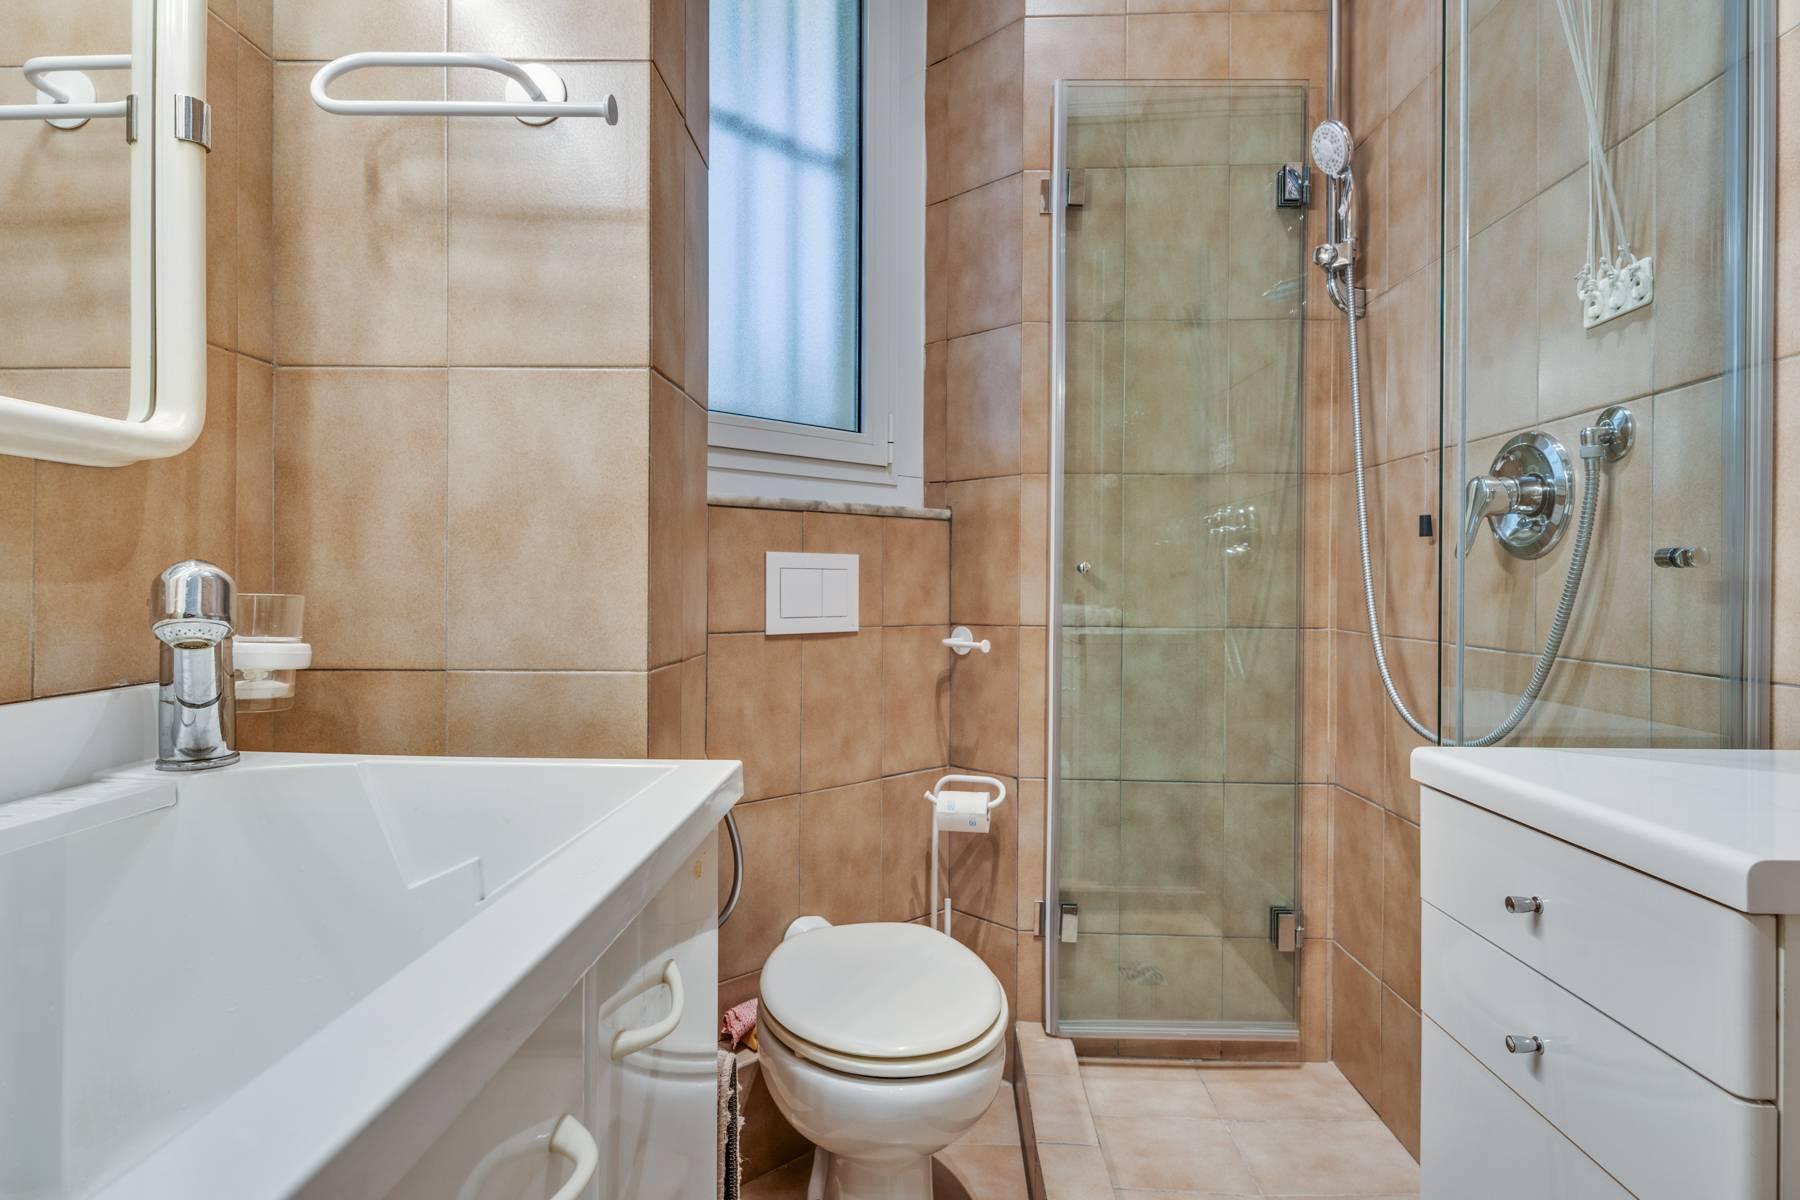 Prestigious 275 sqm apartment inside a period building in Carignano - 25